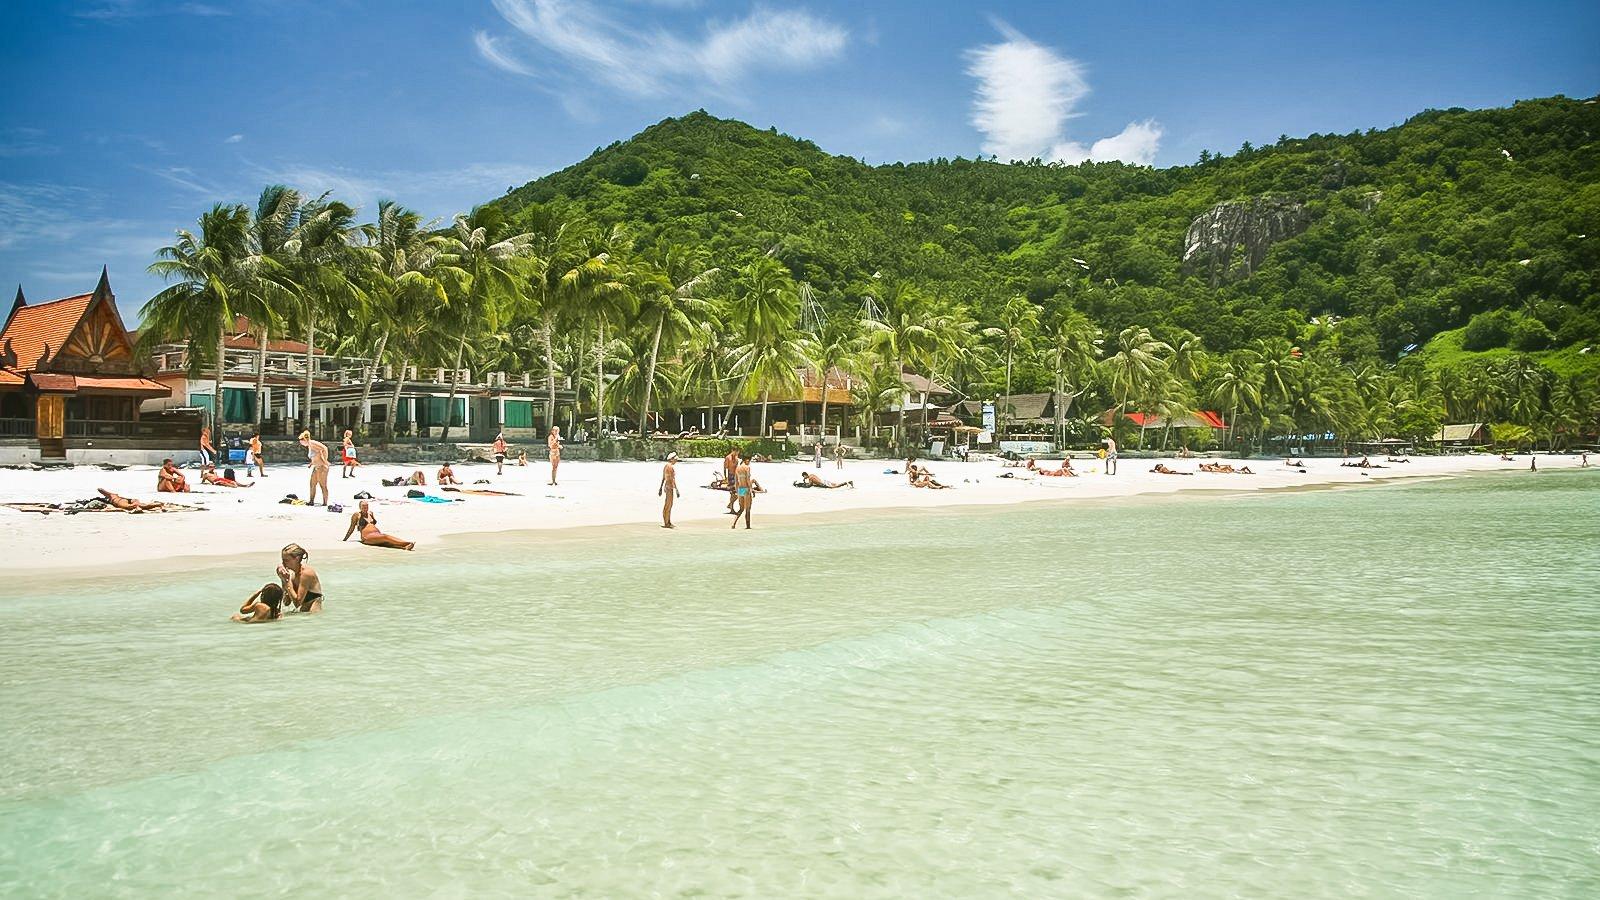 Haad Radin Beach is peninsularbeacharea and town on the southern tip of Ko Phangan.